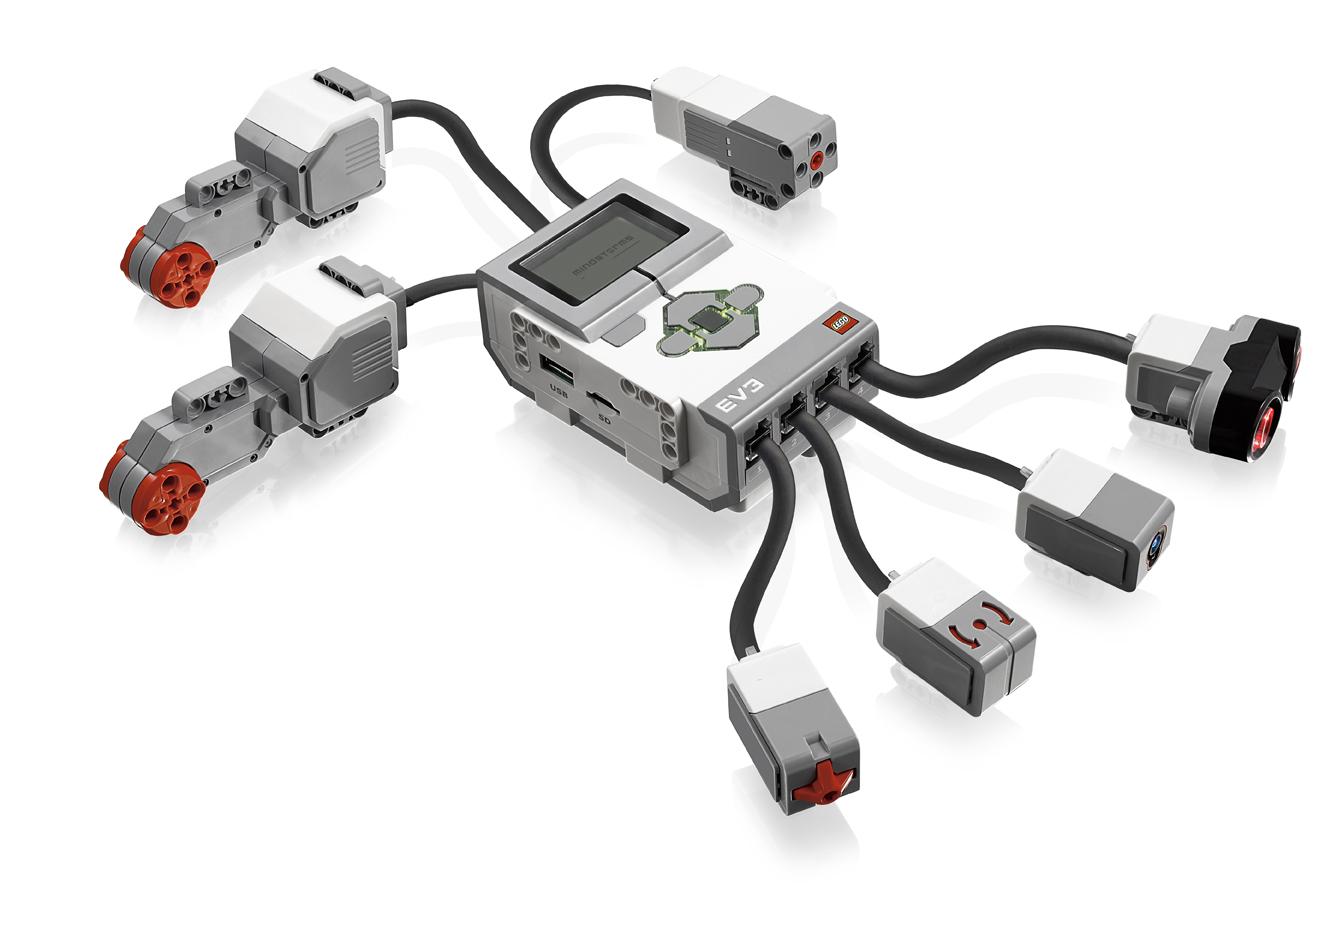 Brique intelligente du LEGO Mindstorms EV3